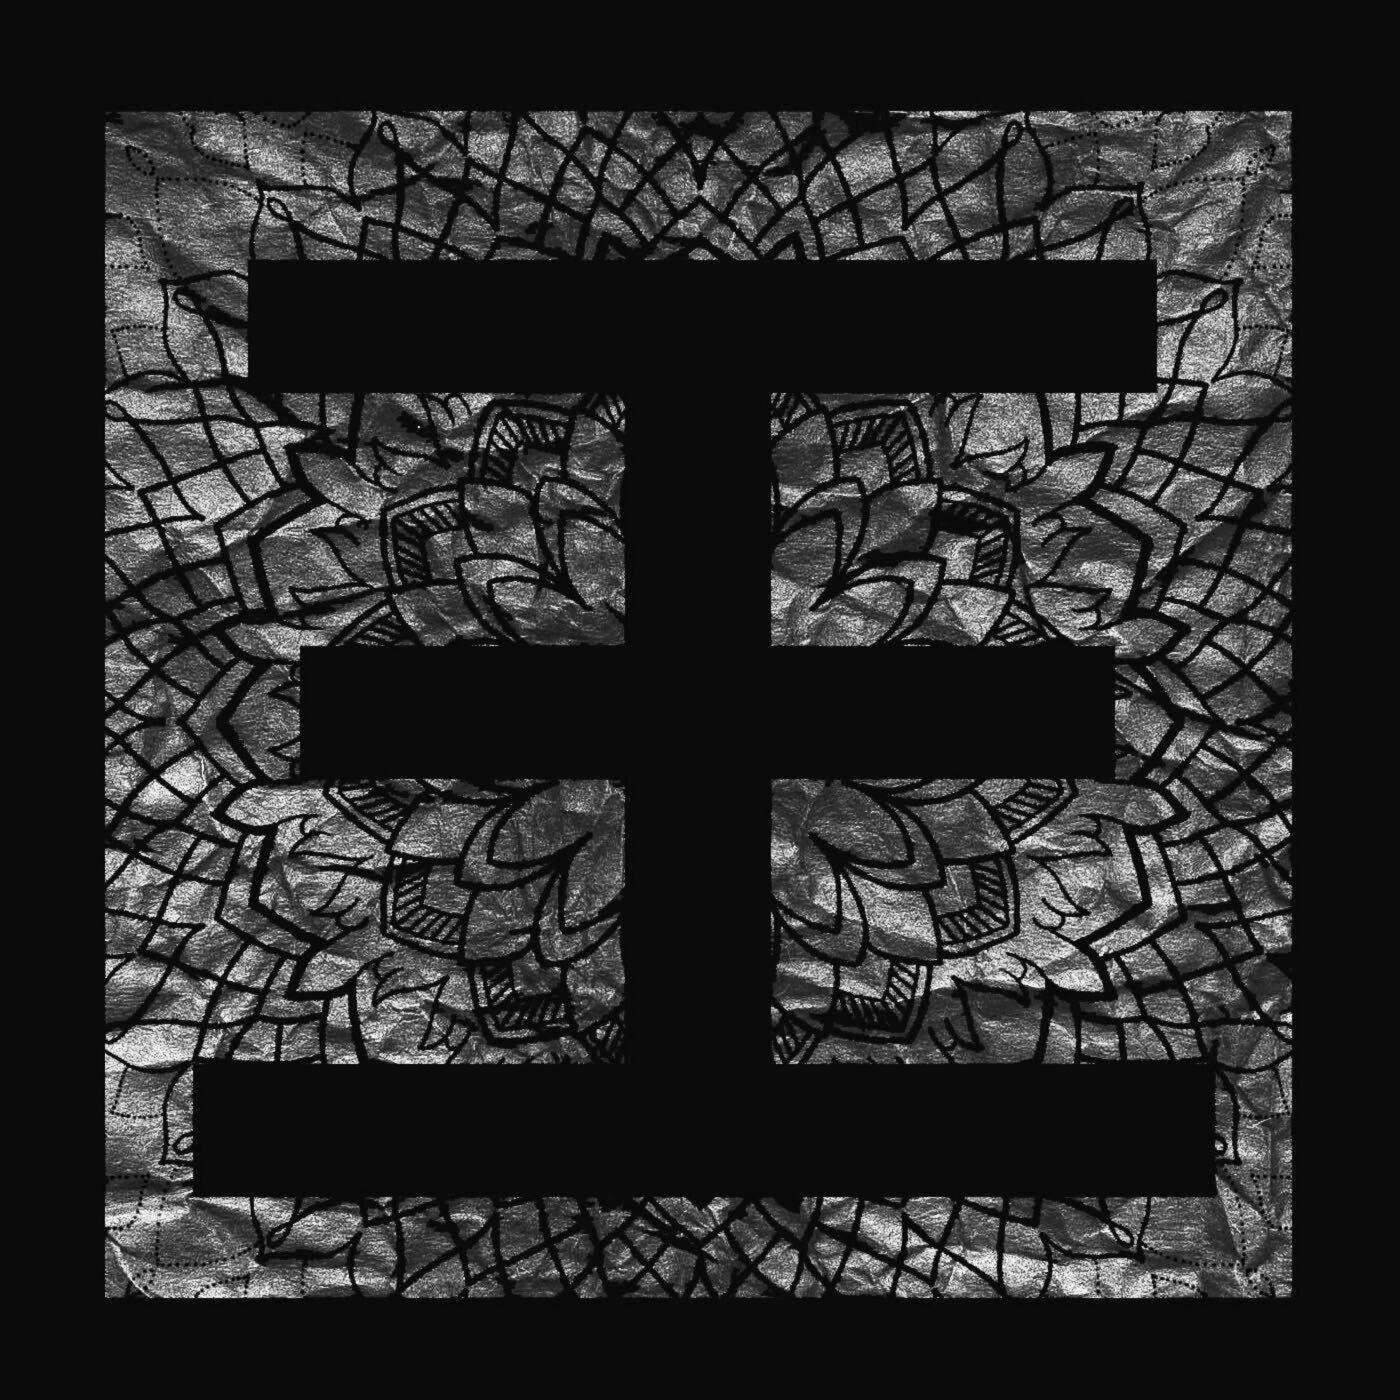 Reflections - Noir [single] (2021)